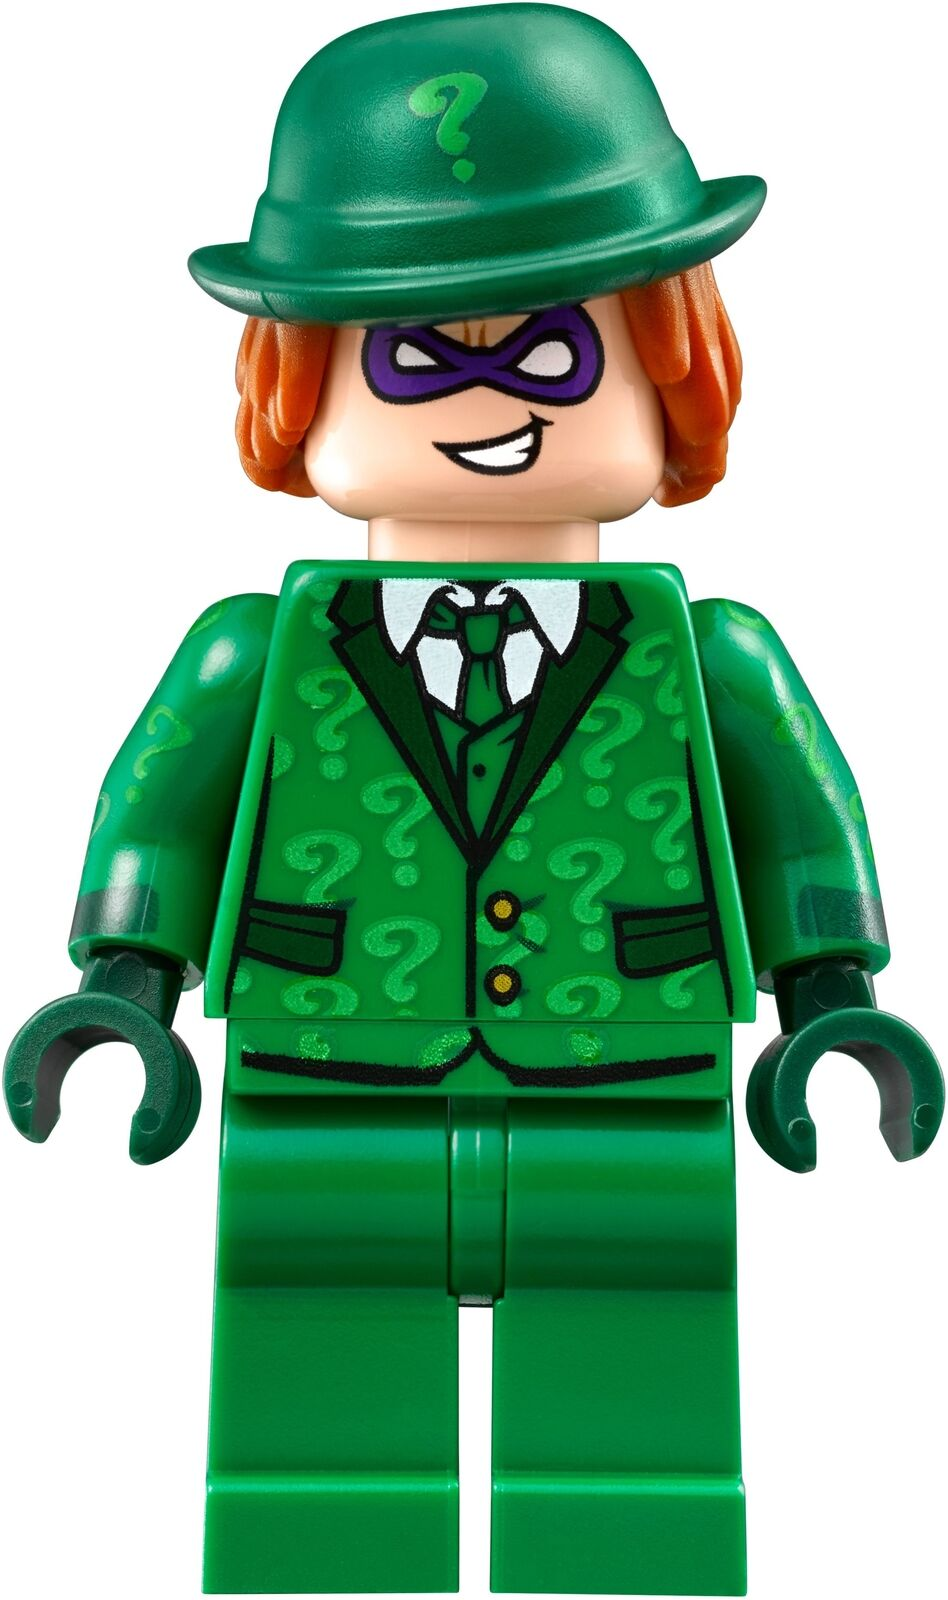 LEGO ® The LEGO ® BatFemme Movie 70903 the the the Homme mystëre ™: Jedusor Racer Neuf neuf dans sa boîte New En parfait état, dans sa boîte scellée 115e3c